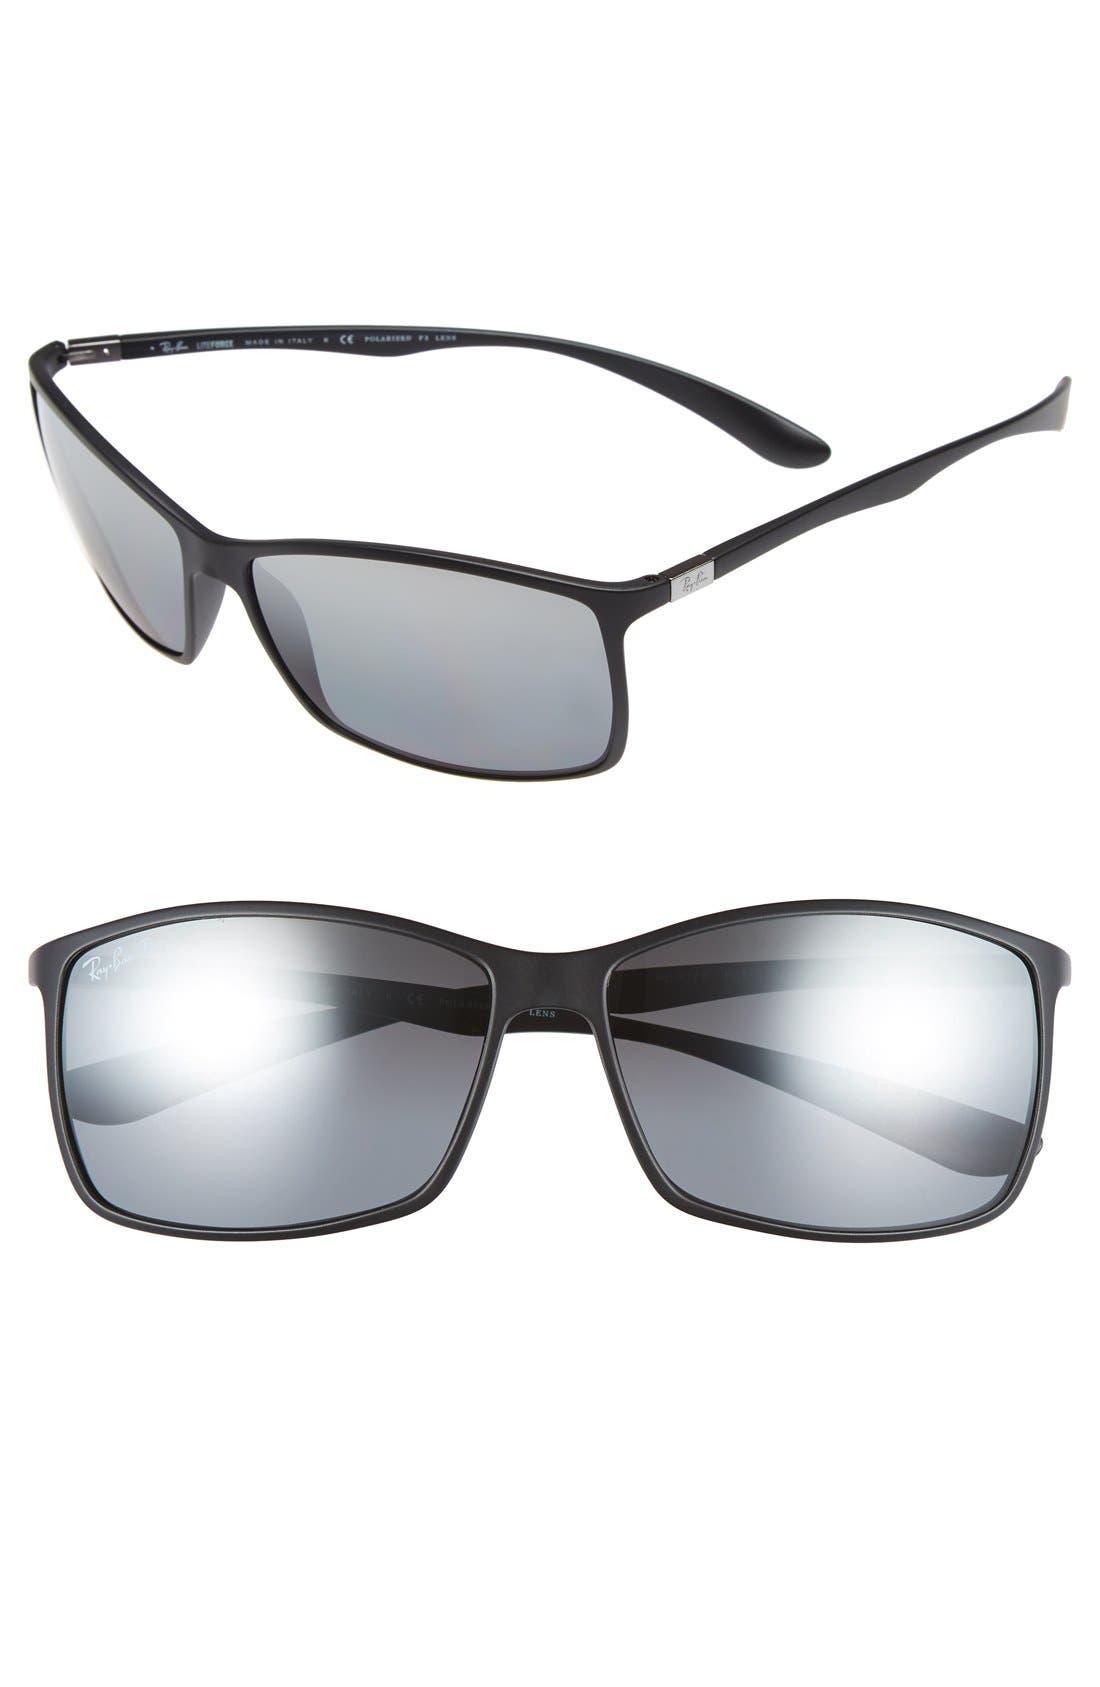 'TECH Liteforce' 62mm Polarized Sunglasses,                             Main thumbnail 1, color,                             MATTE BLACK/ GREY MIRROR P